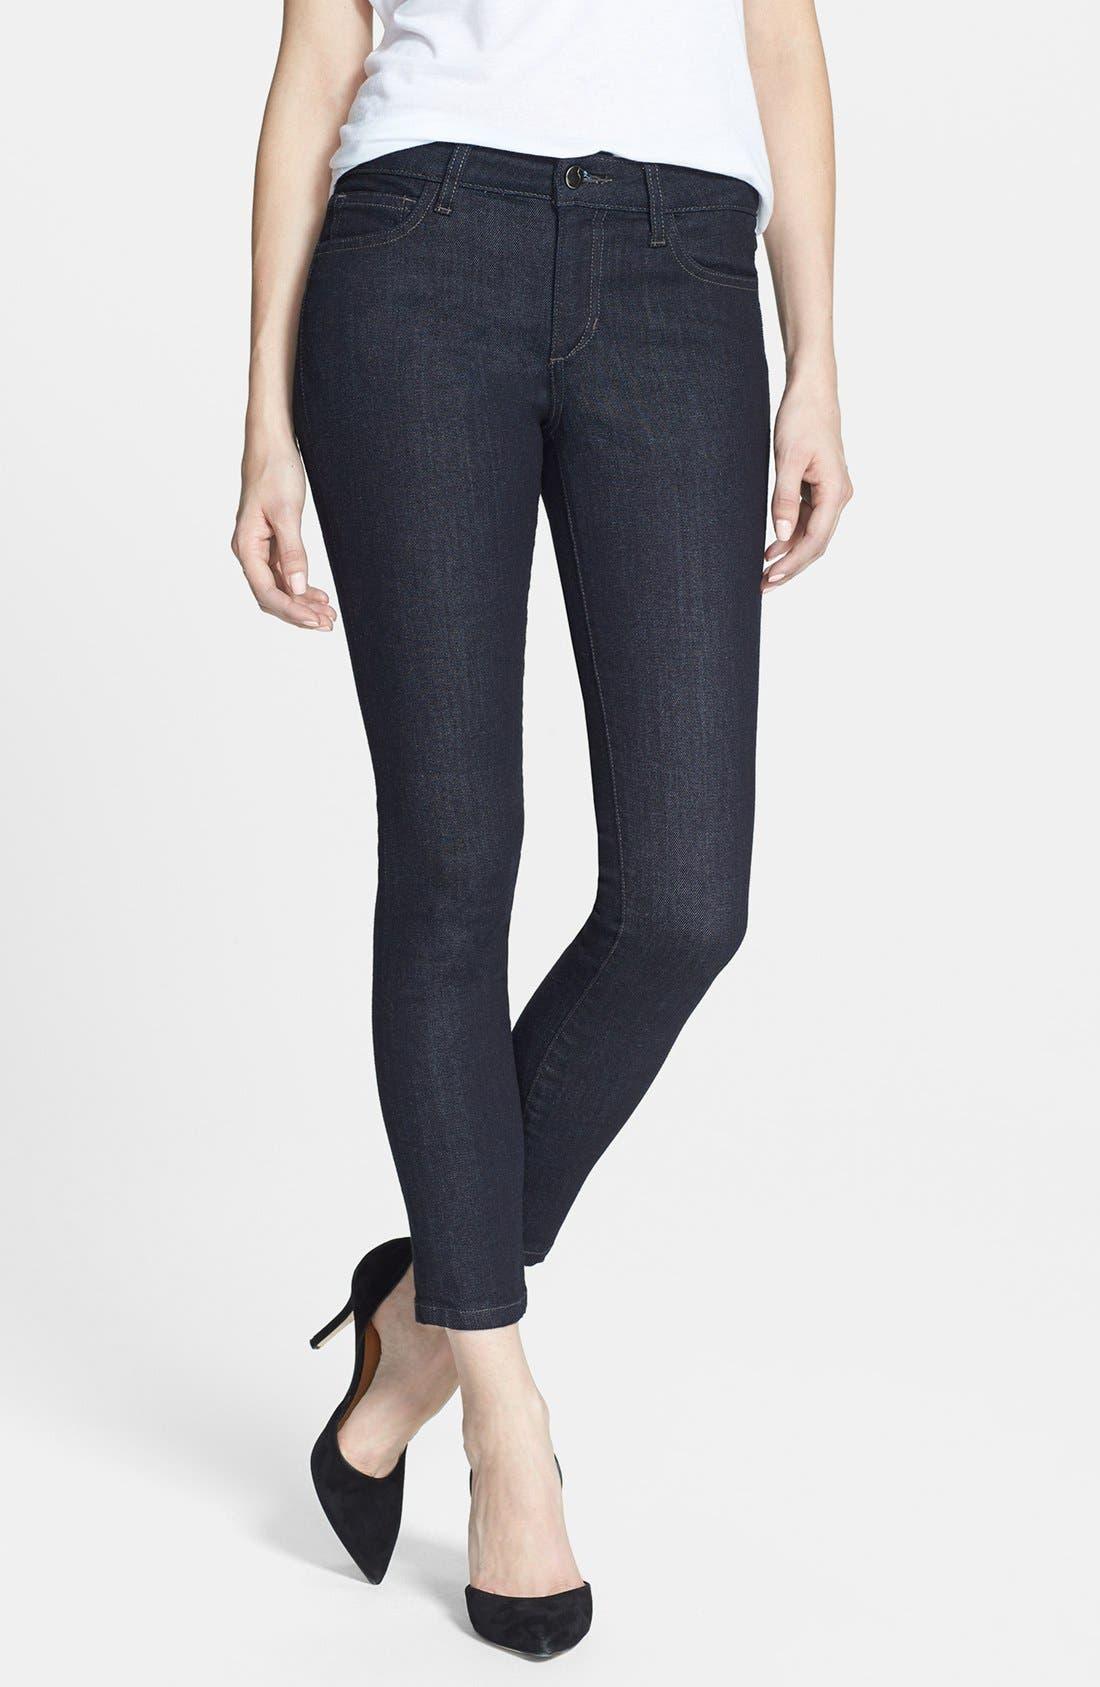 Alternate Image 1 Selected - Joe's Skinny Ankle Jeans (Delia)